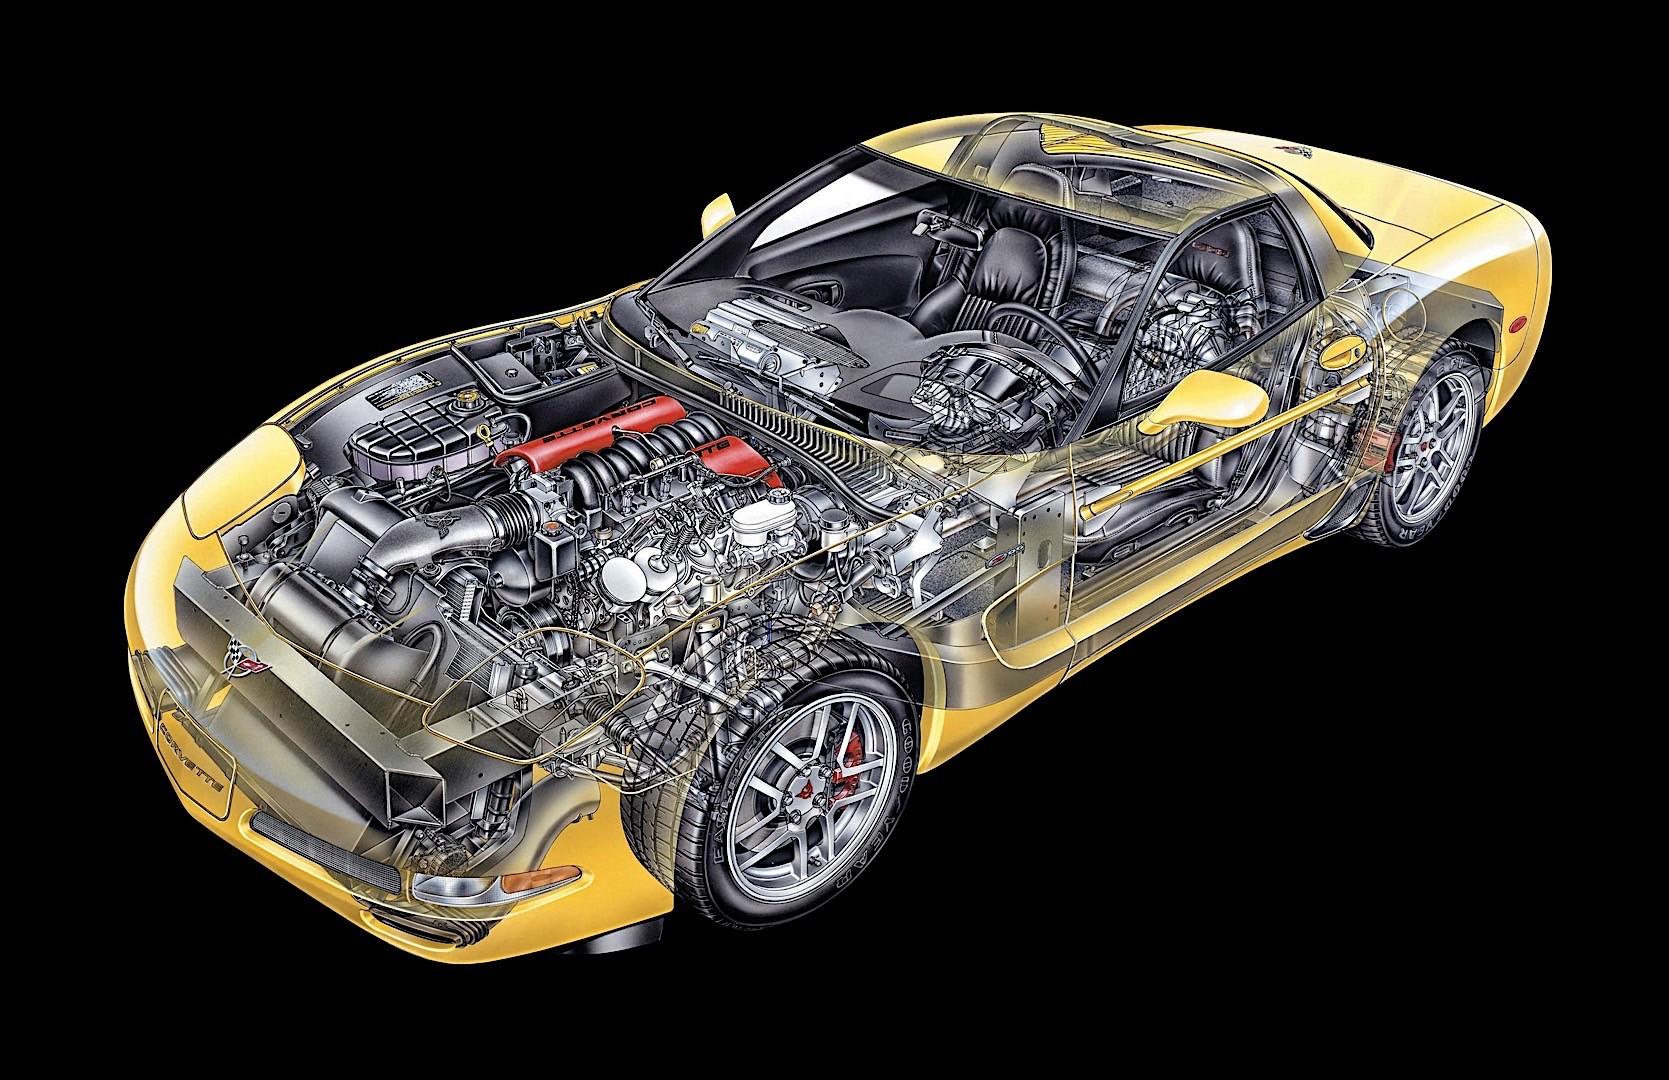 CHEVROLET Corvette C5 Z06 specs & photos - 2001, 2002 ...